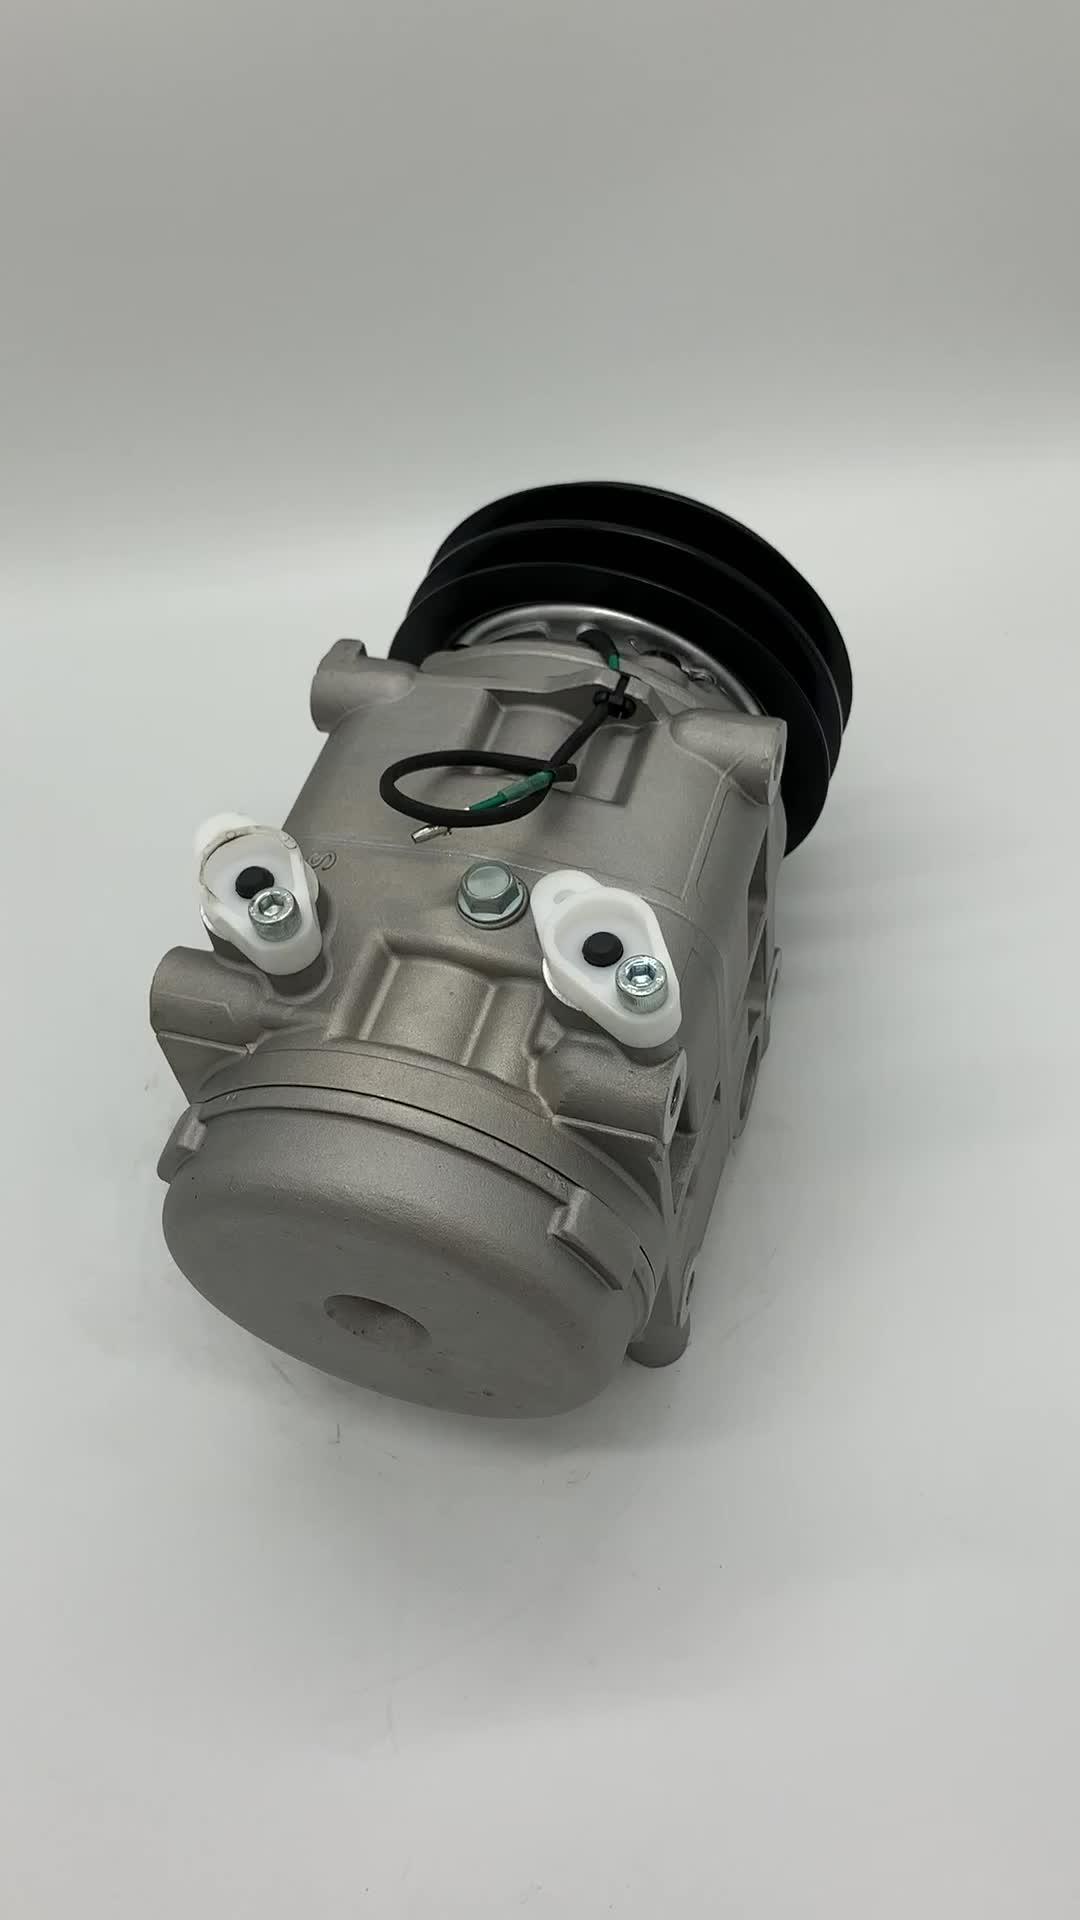 TM31 DKS32 ประเภทอัตโนมัติ AC คอมเพรสเซอร์สำหรับรถบัส/Refrigerated truck